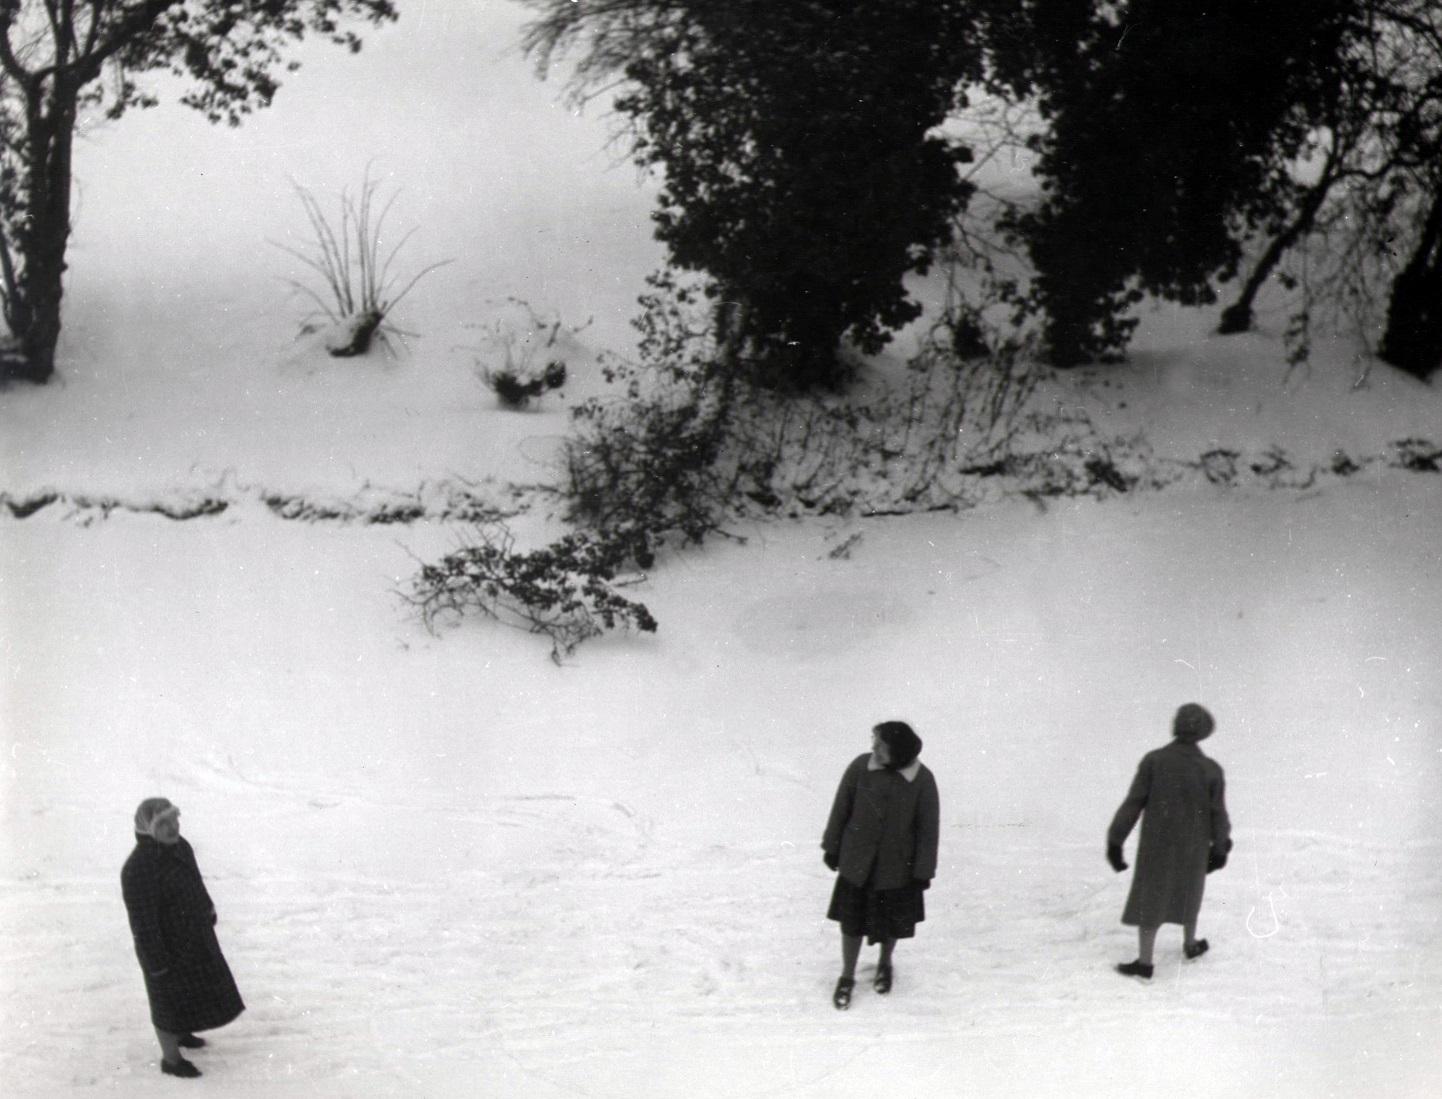 St Hilda's Fellows walking on the frozen river Cherwell, c 1963